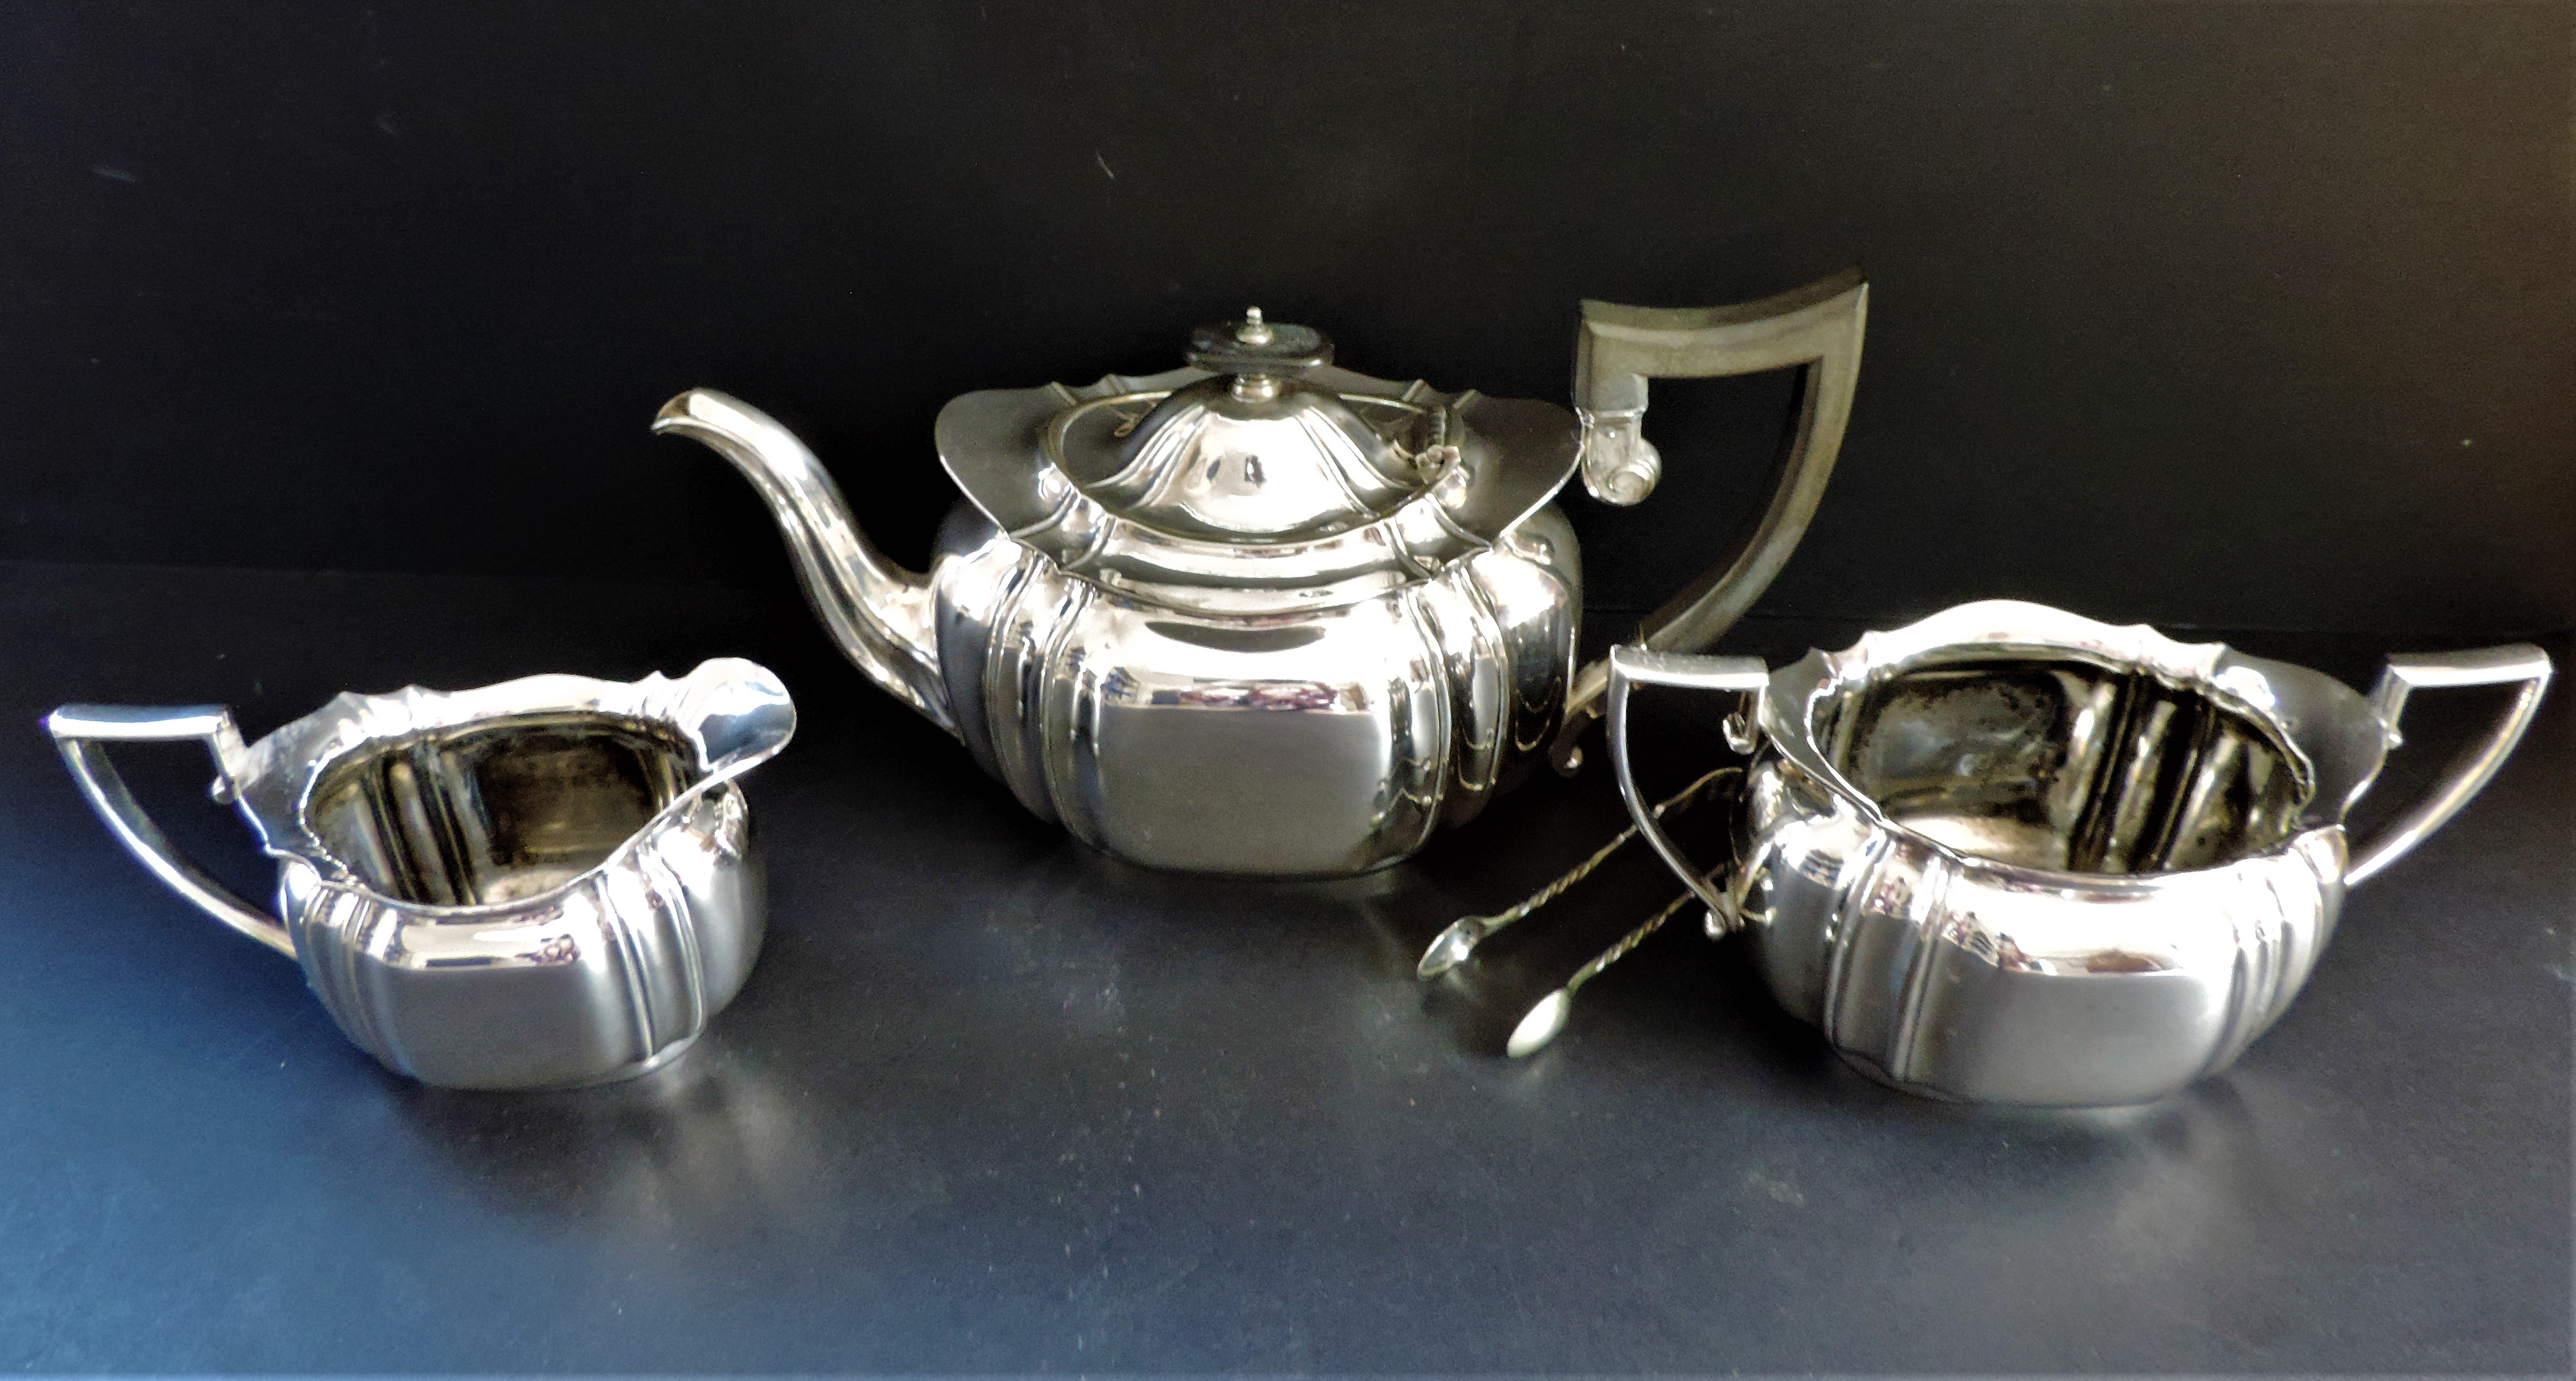 Antique Edwardian 4 Piece Silver Plated Tea Set circa 1900-1910 - Image 2 of 7